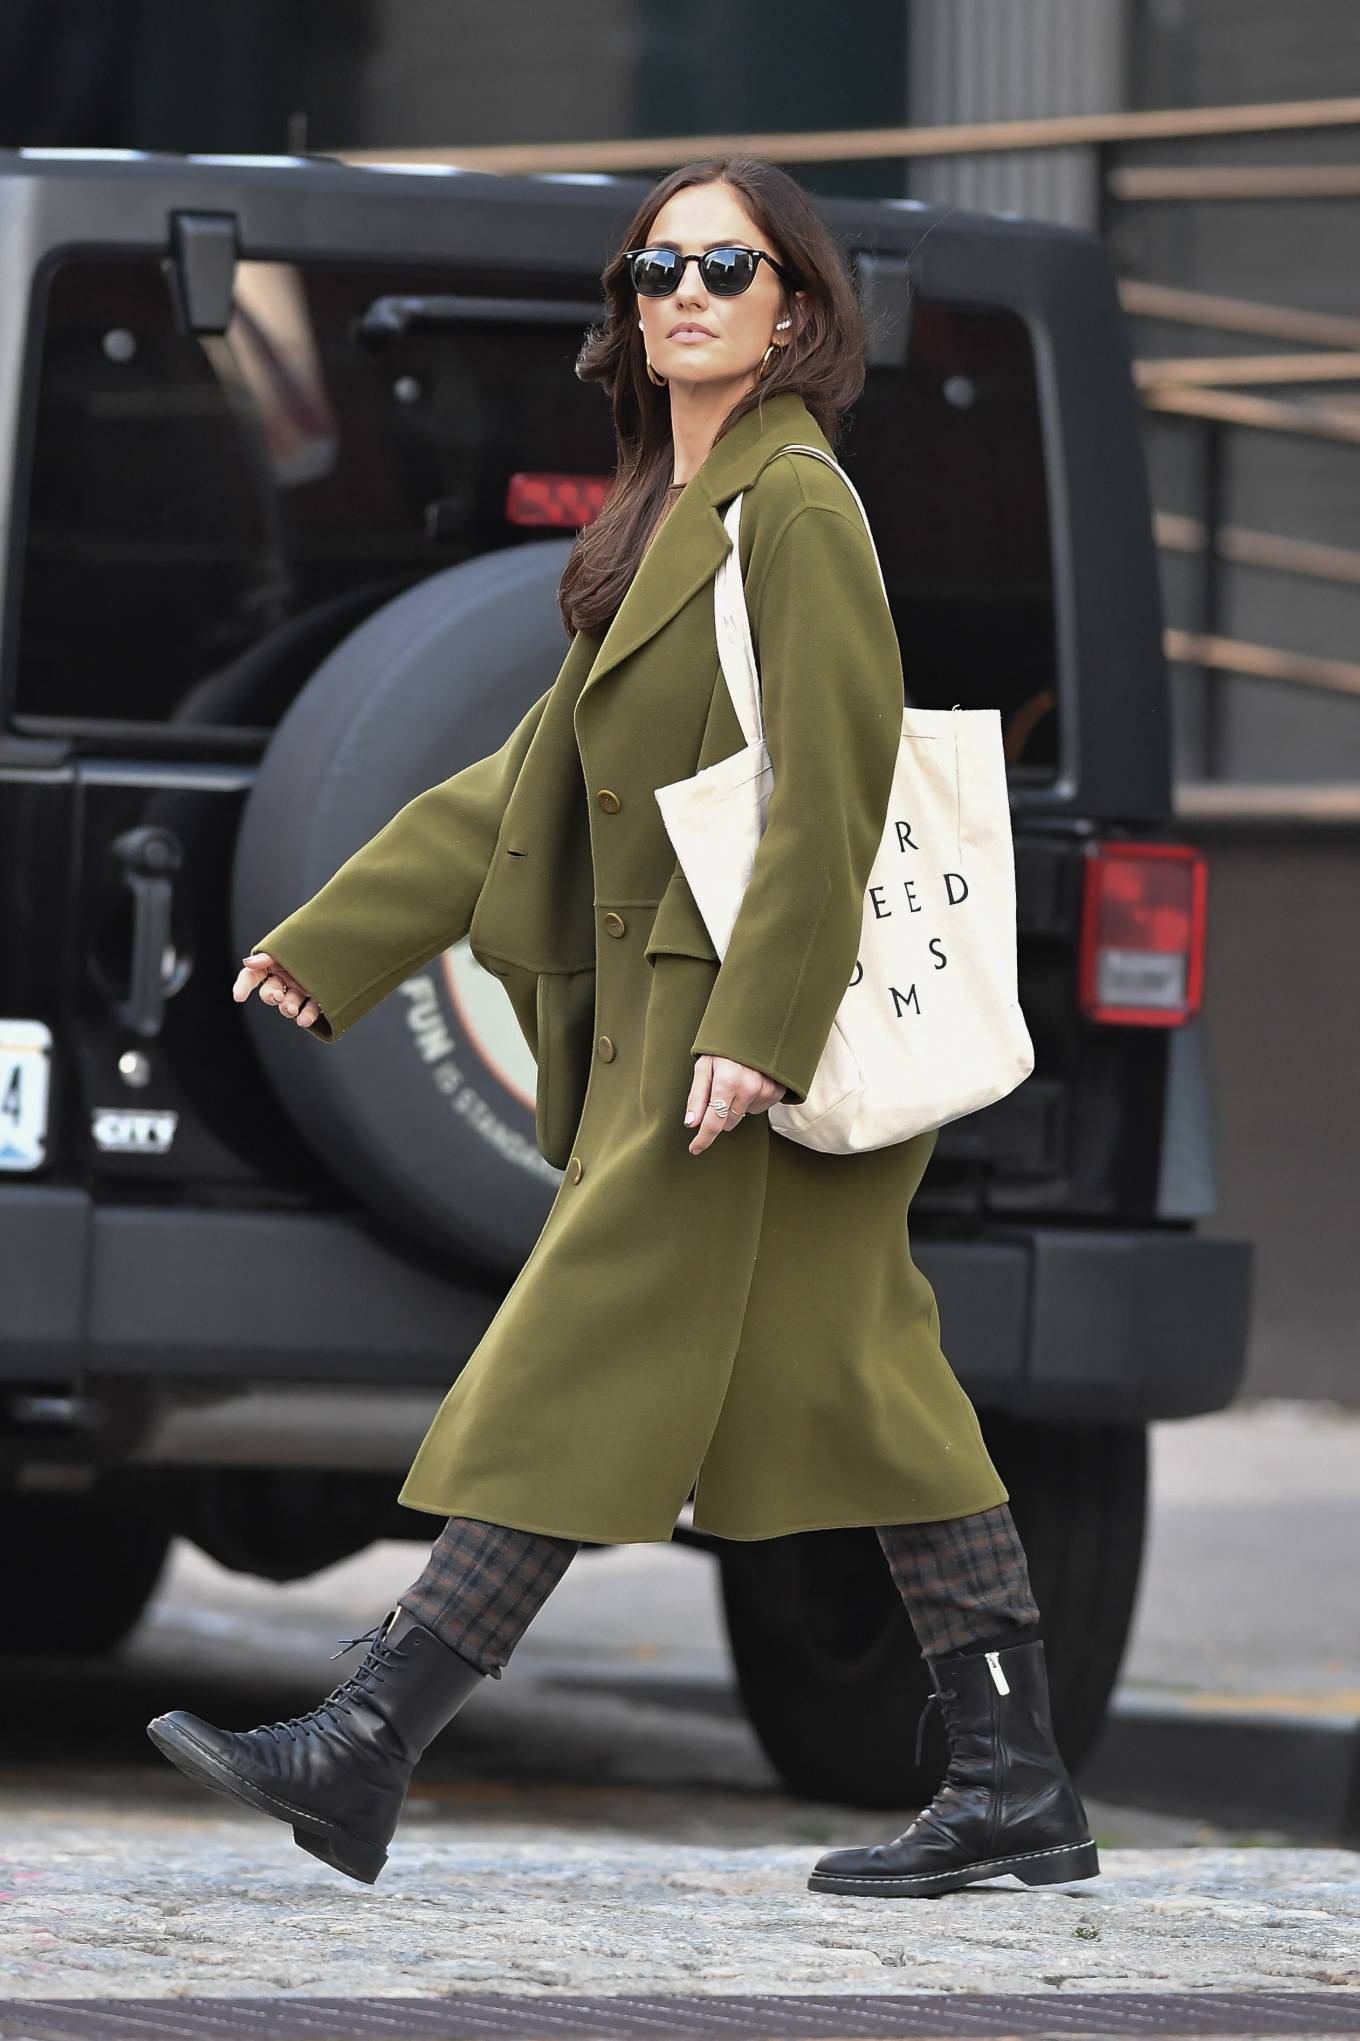 Minka Kelly 2021 : Minka Kelly – In olive green runs errands in New York-14